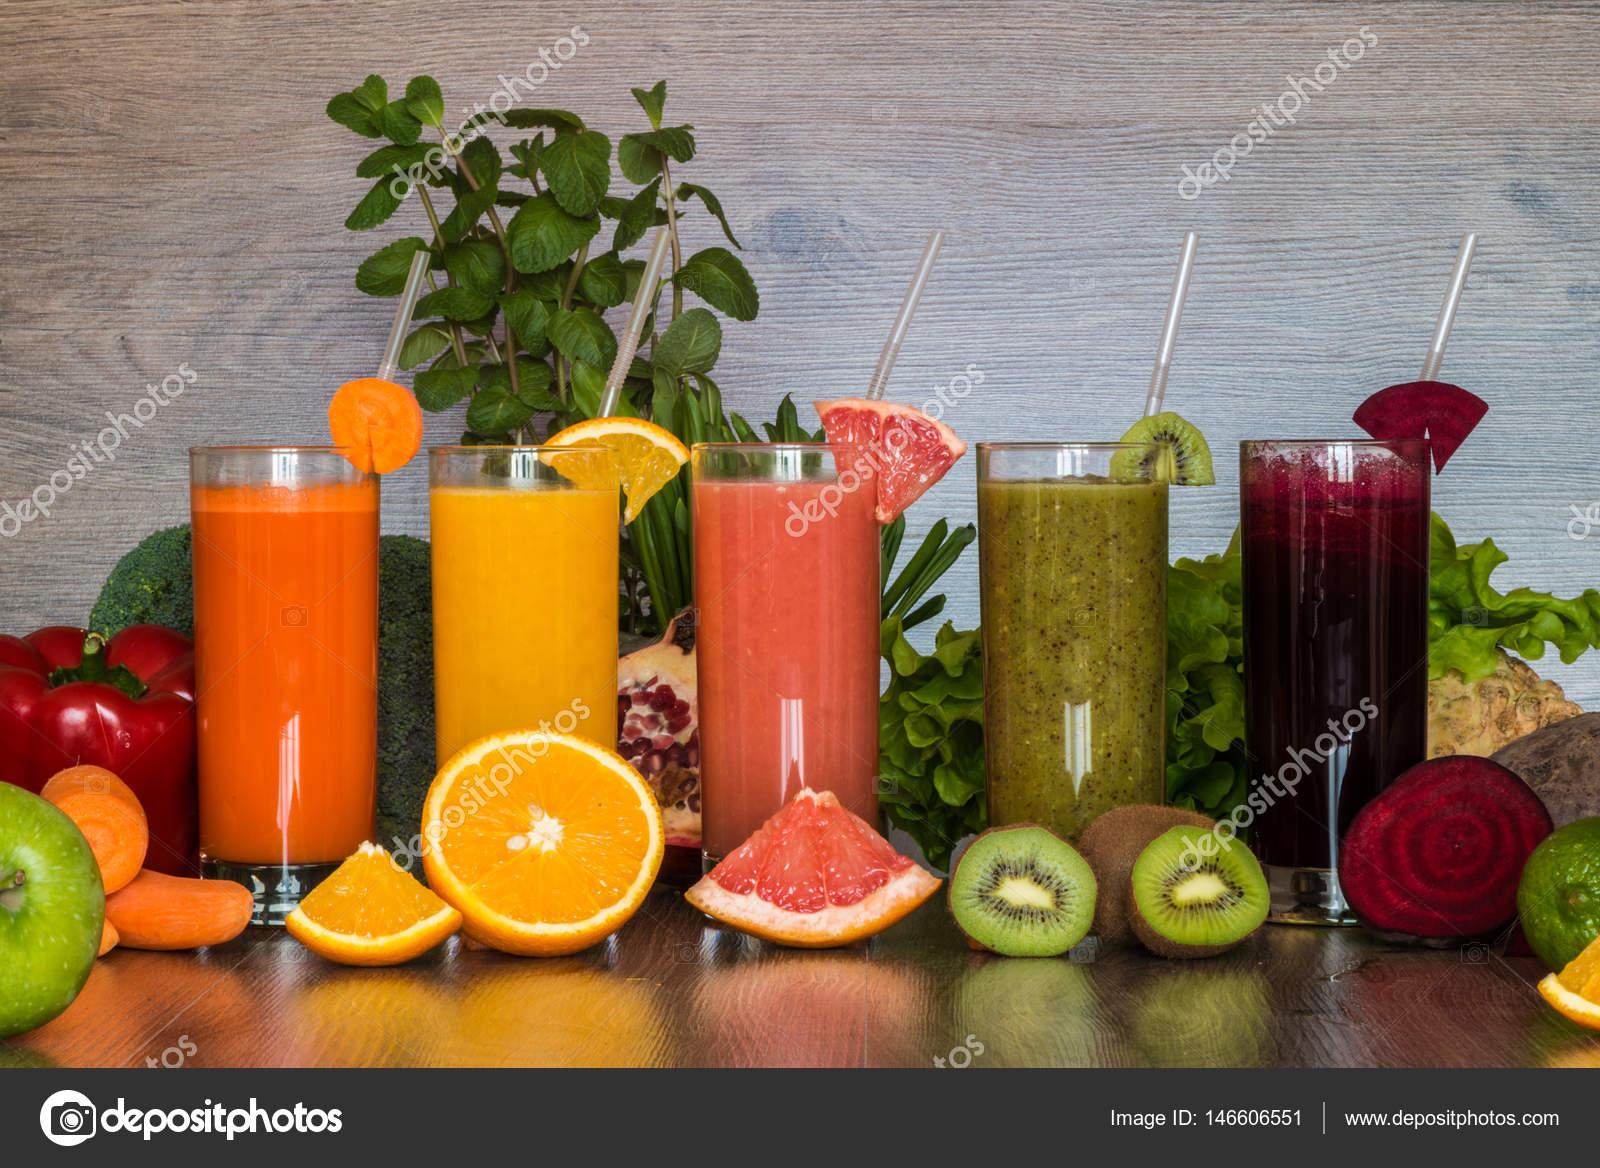 dieta de zumos y verduras